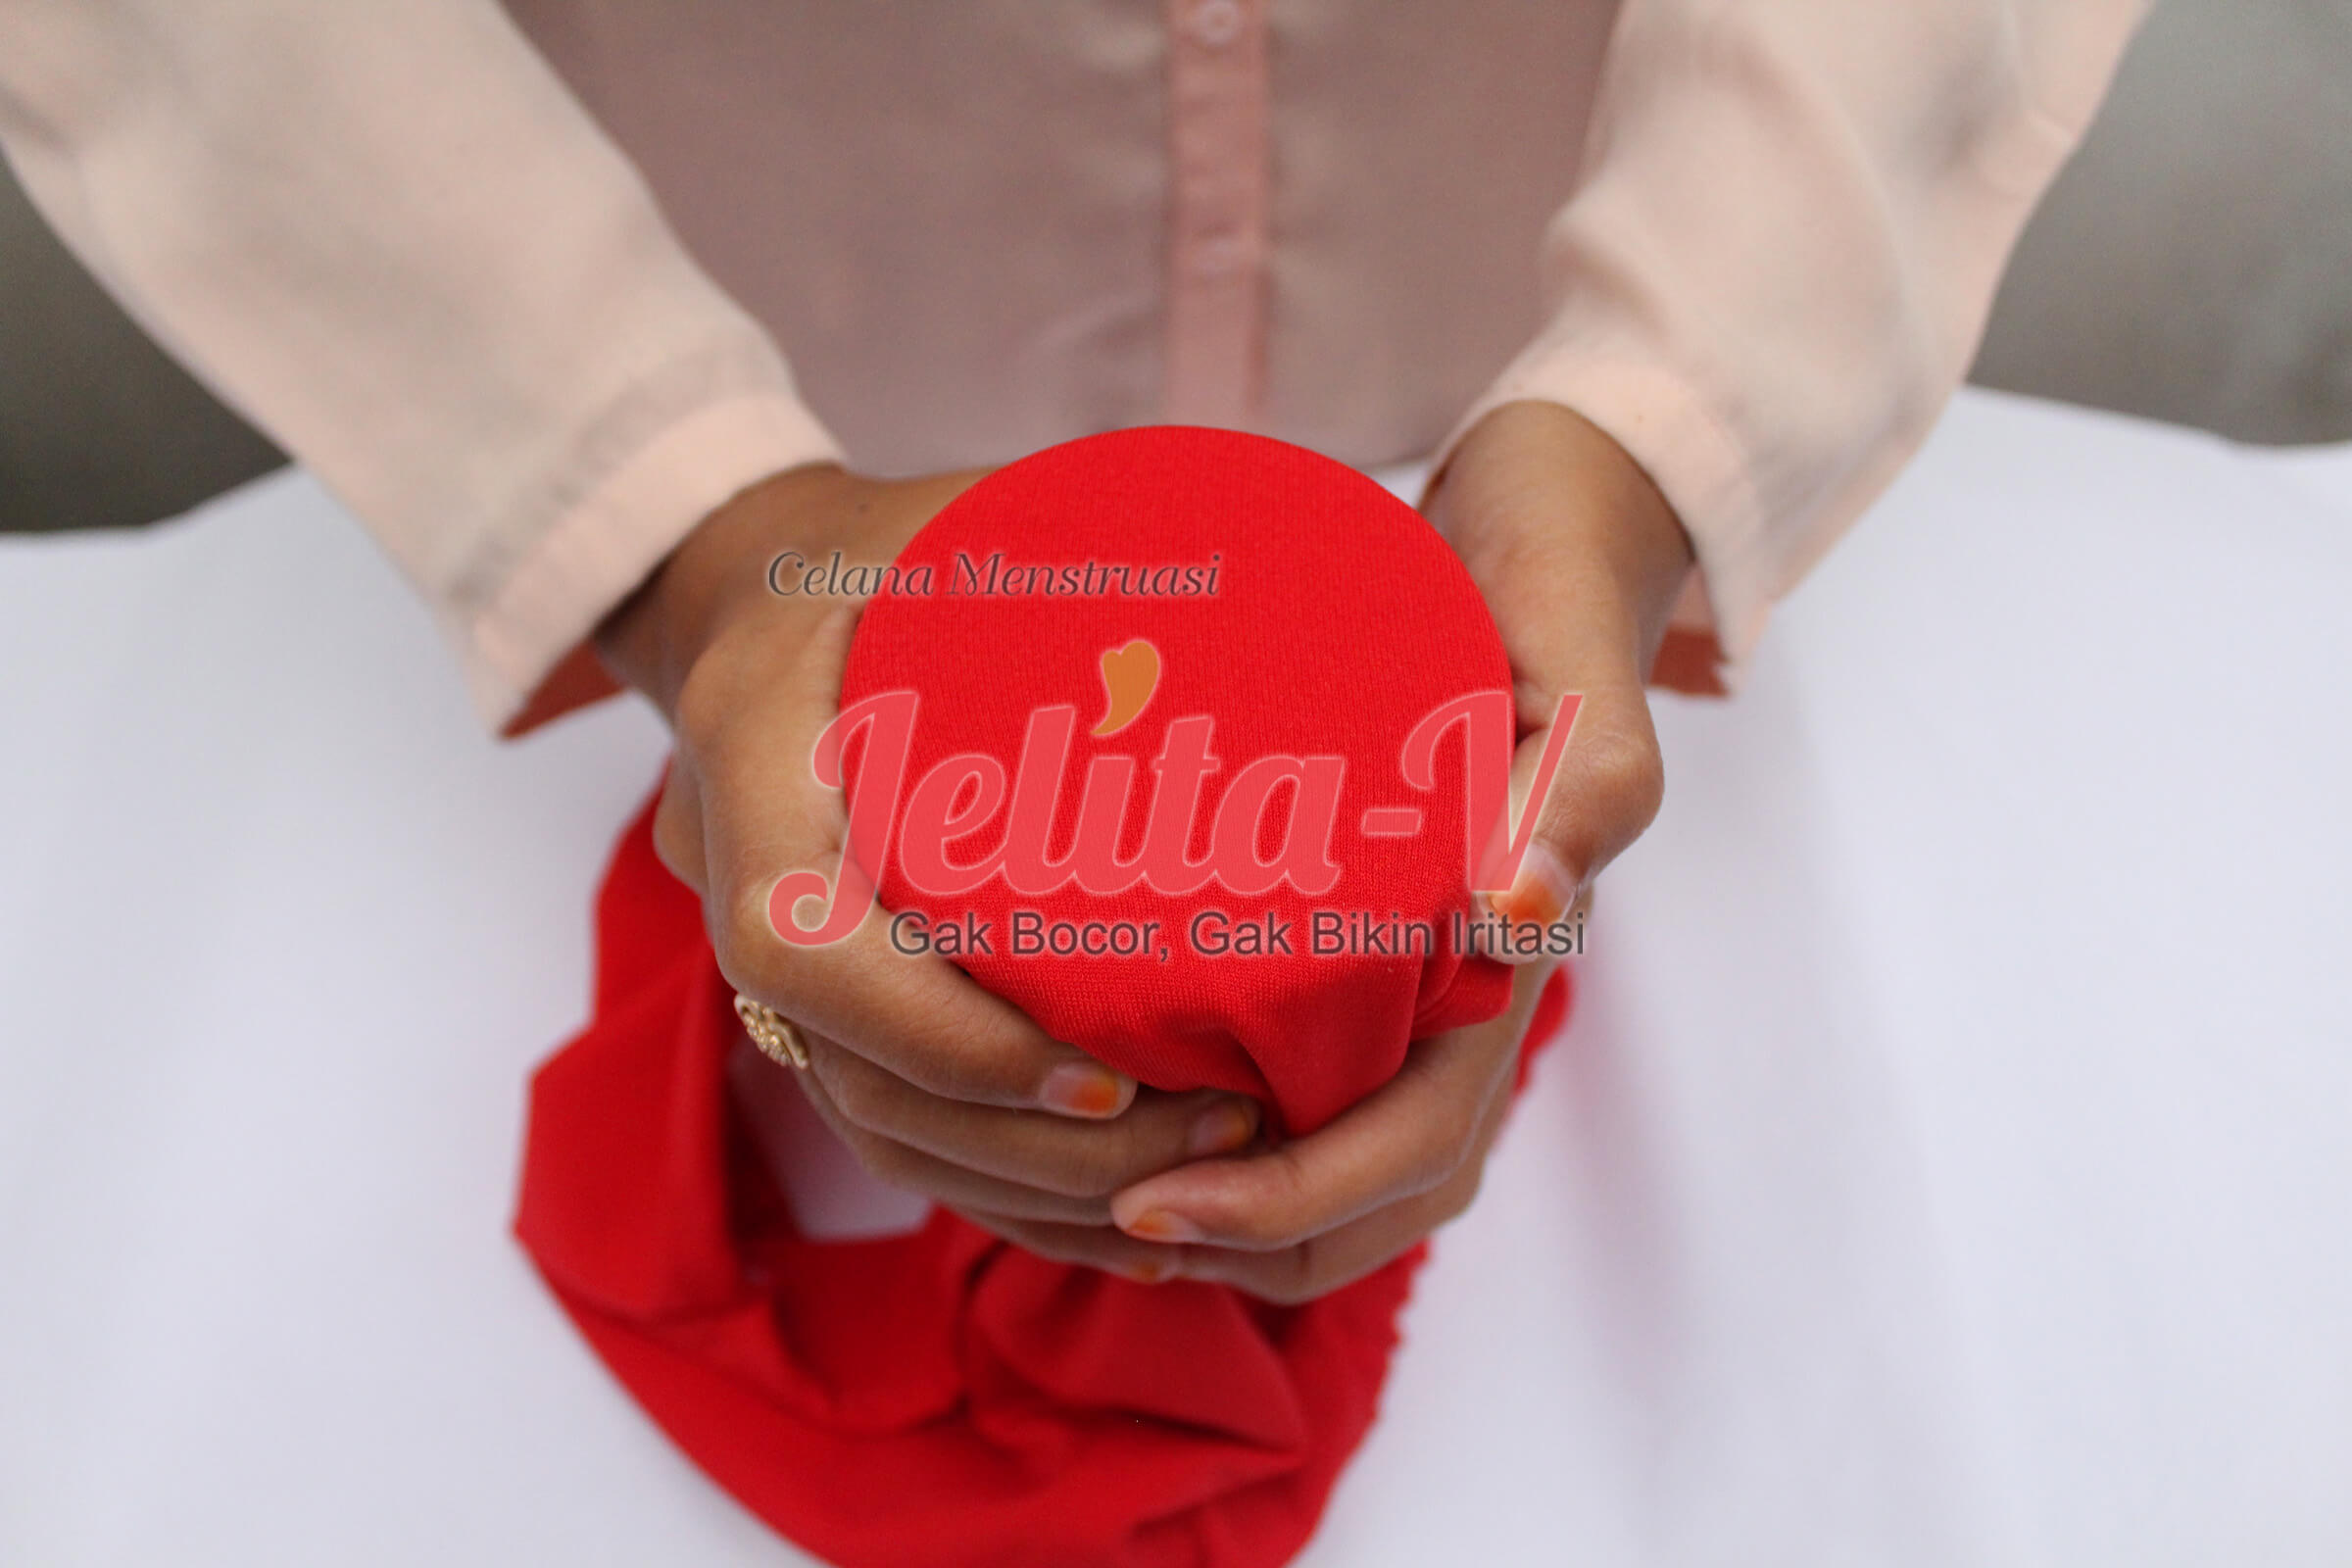 test-waterproof-celana-menstruasi-jelita-2